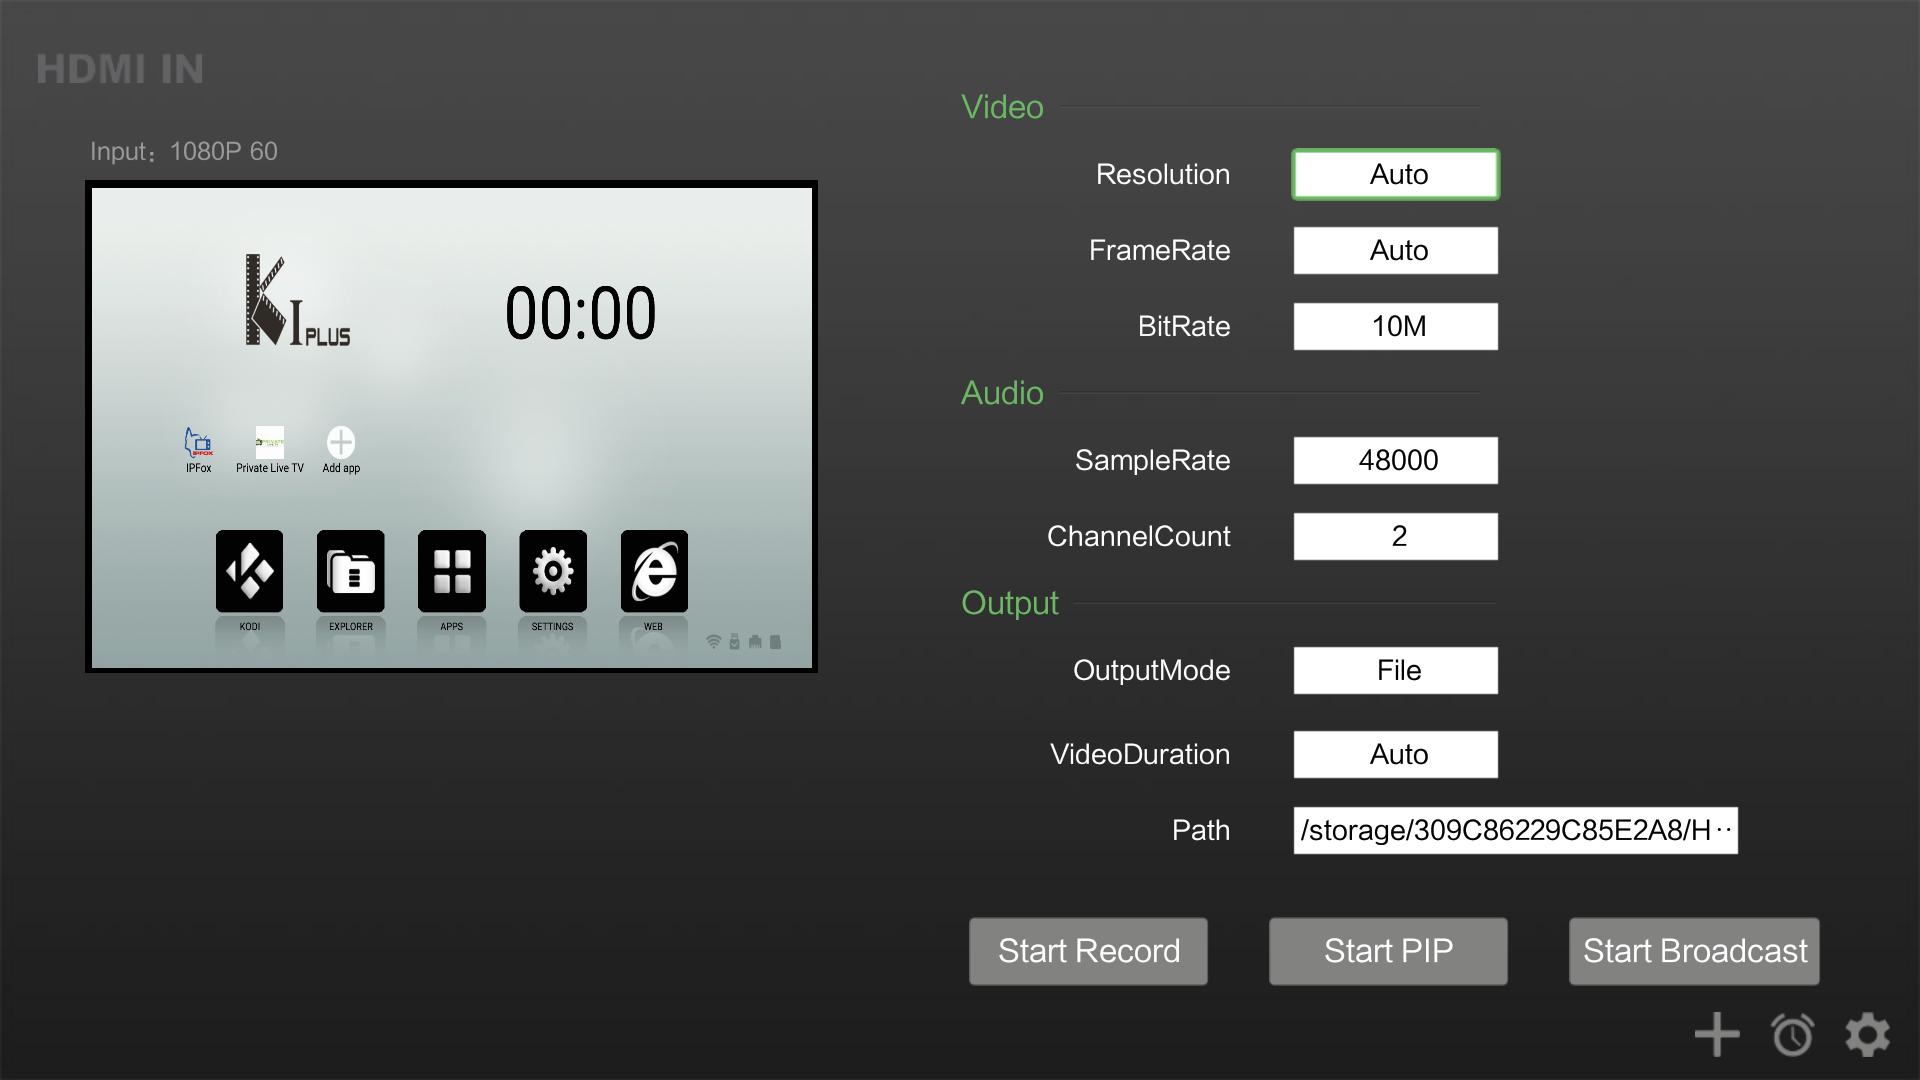 Zidoo X9S Android TV Box HDMI Input Testing – Video Recording, PiP